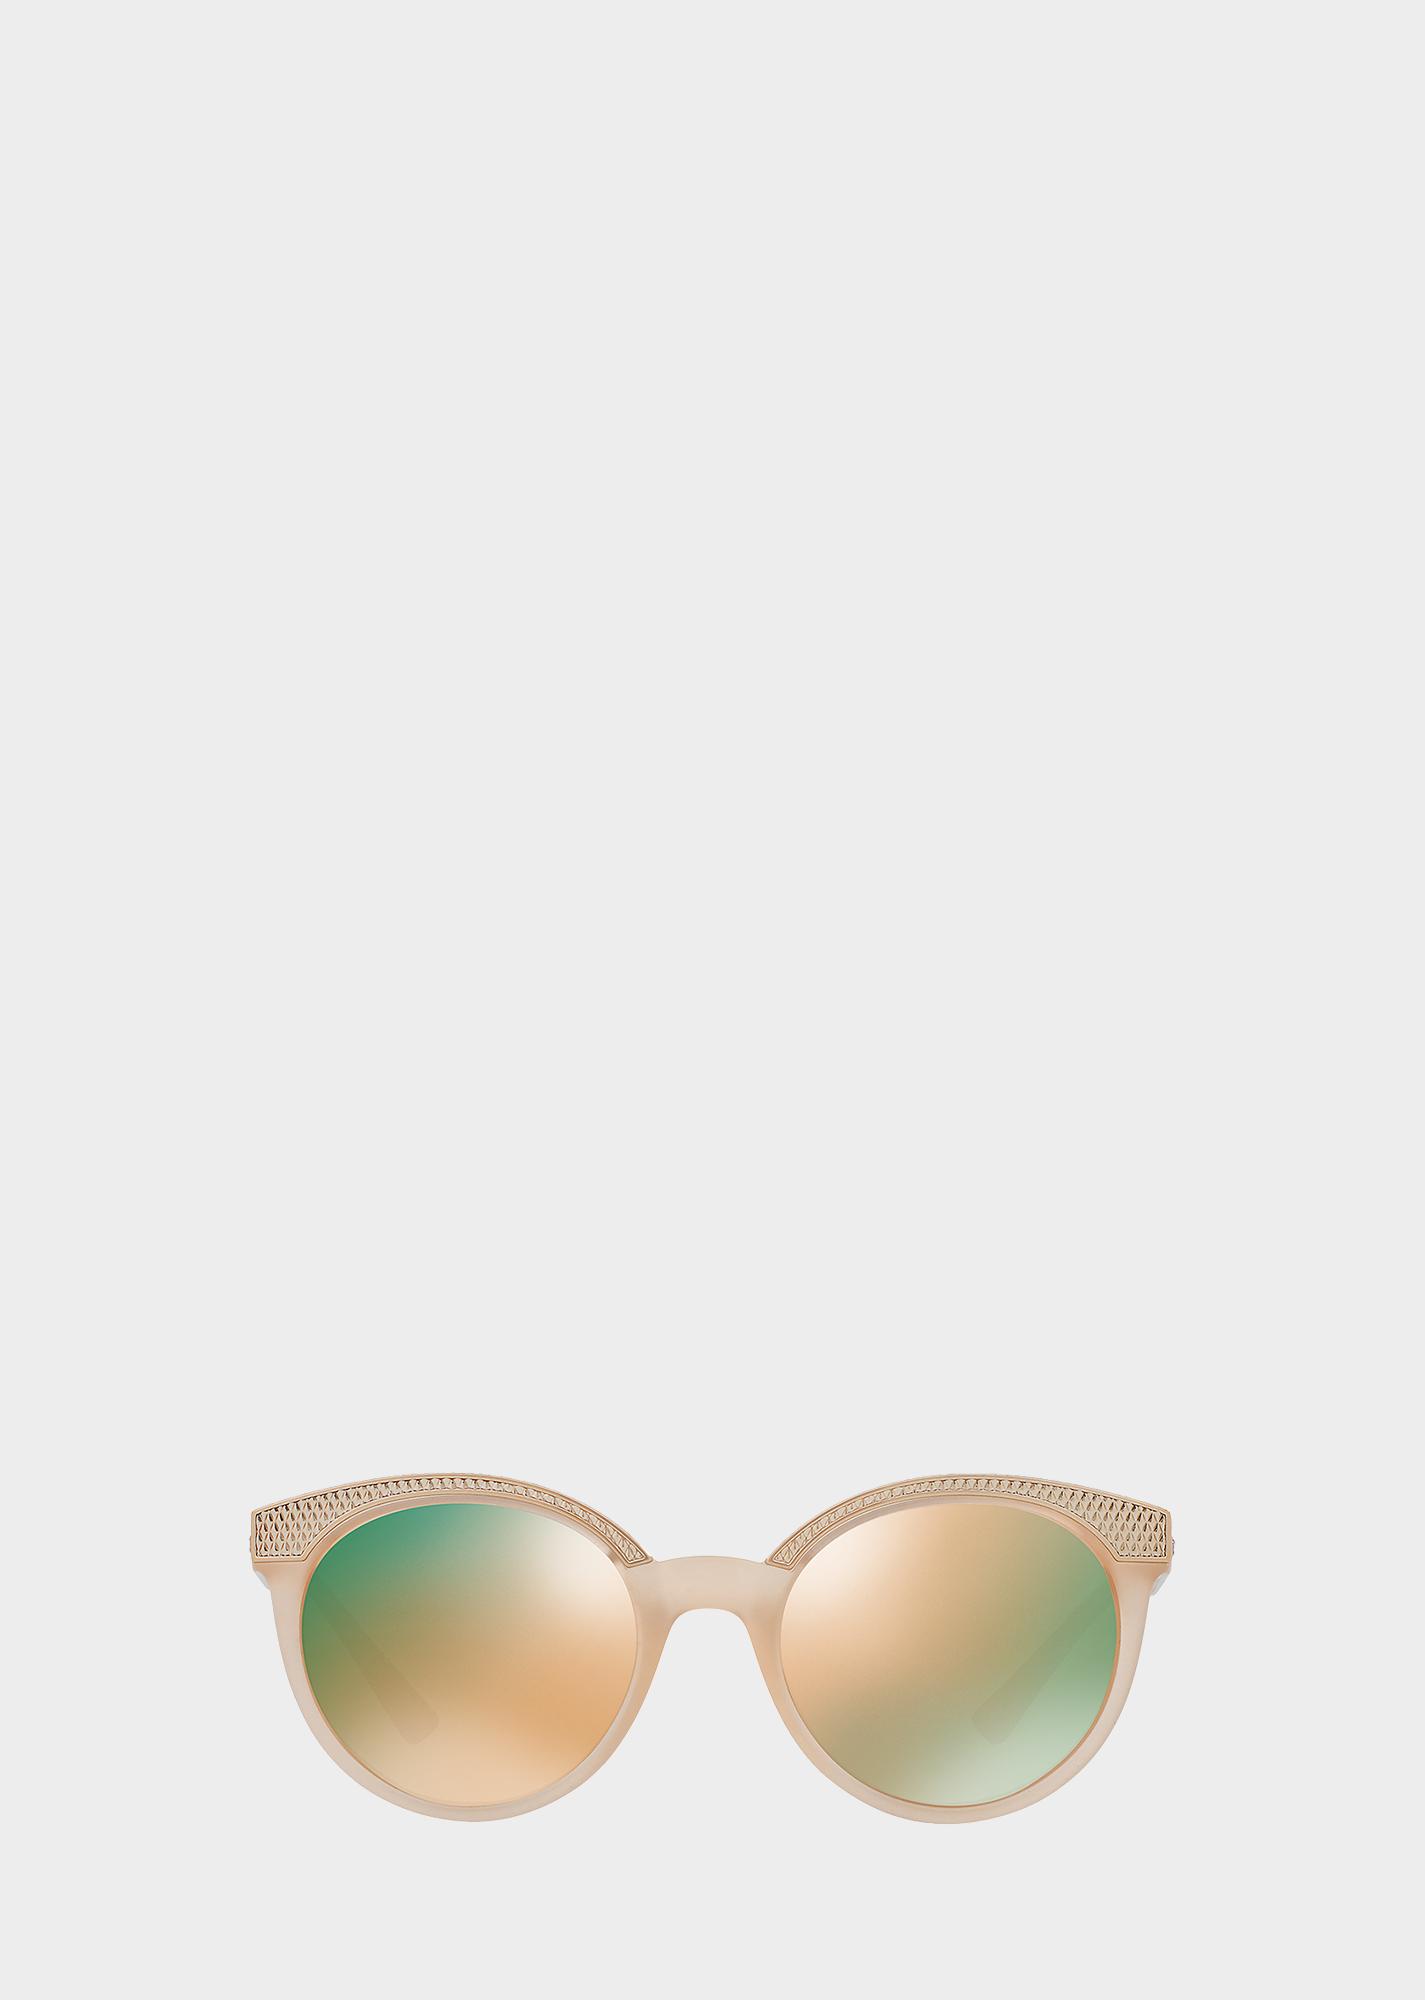 Versace Opal Blush VMesh Slim Sunglasses Opal blush